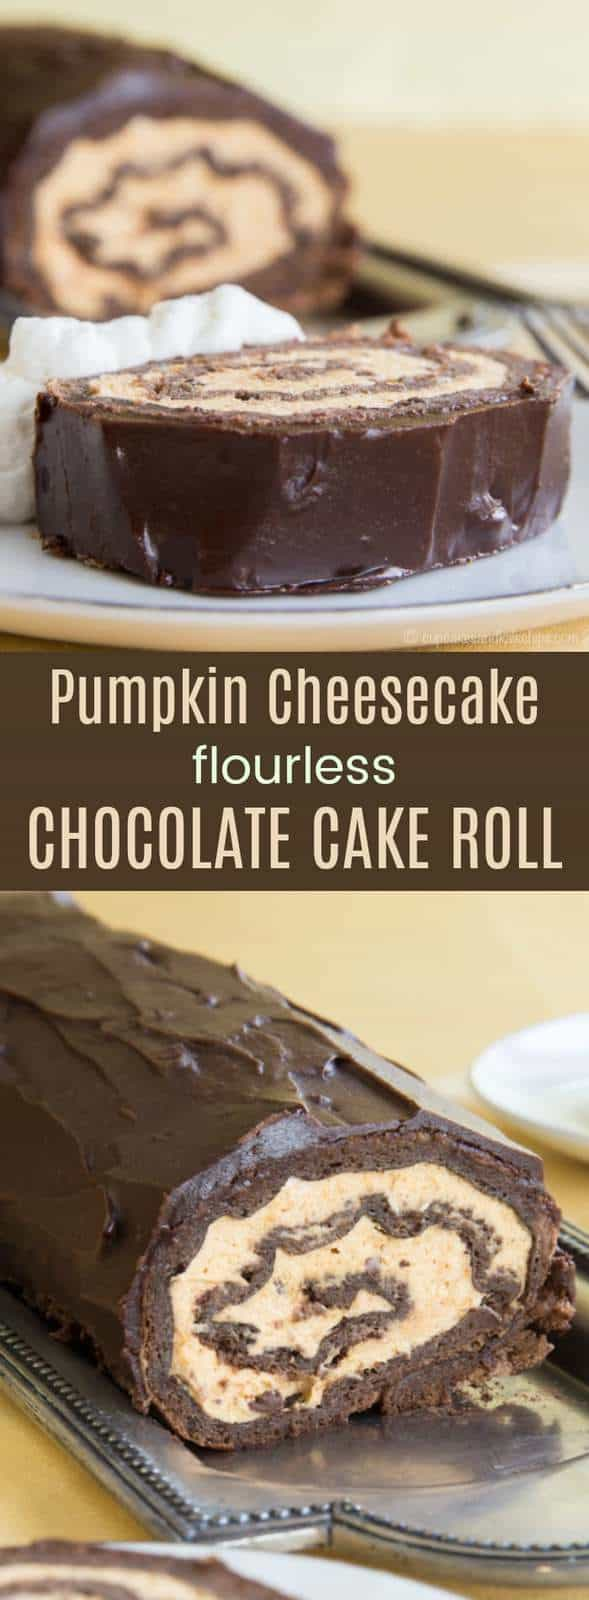 Vanilla Sauce For Flourless Chocolate Cake